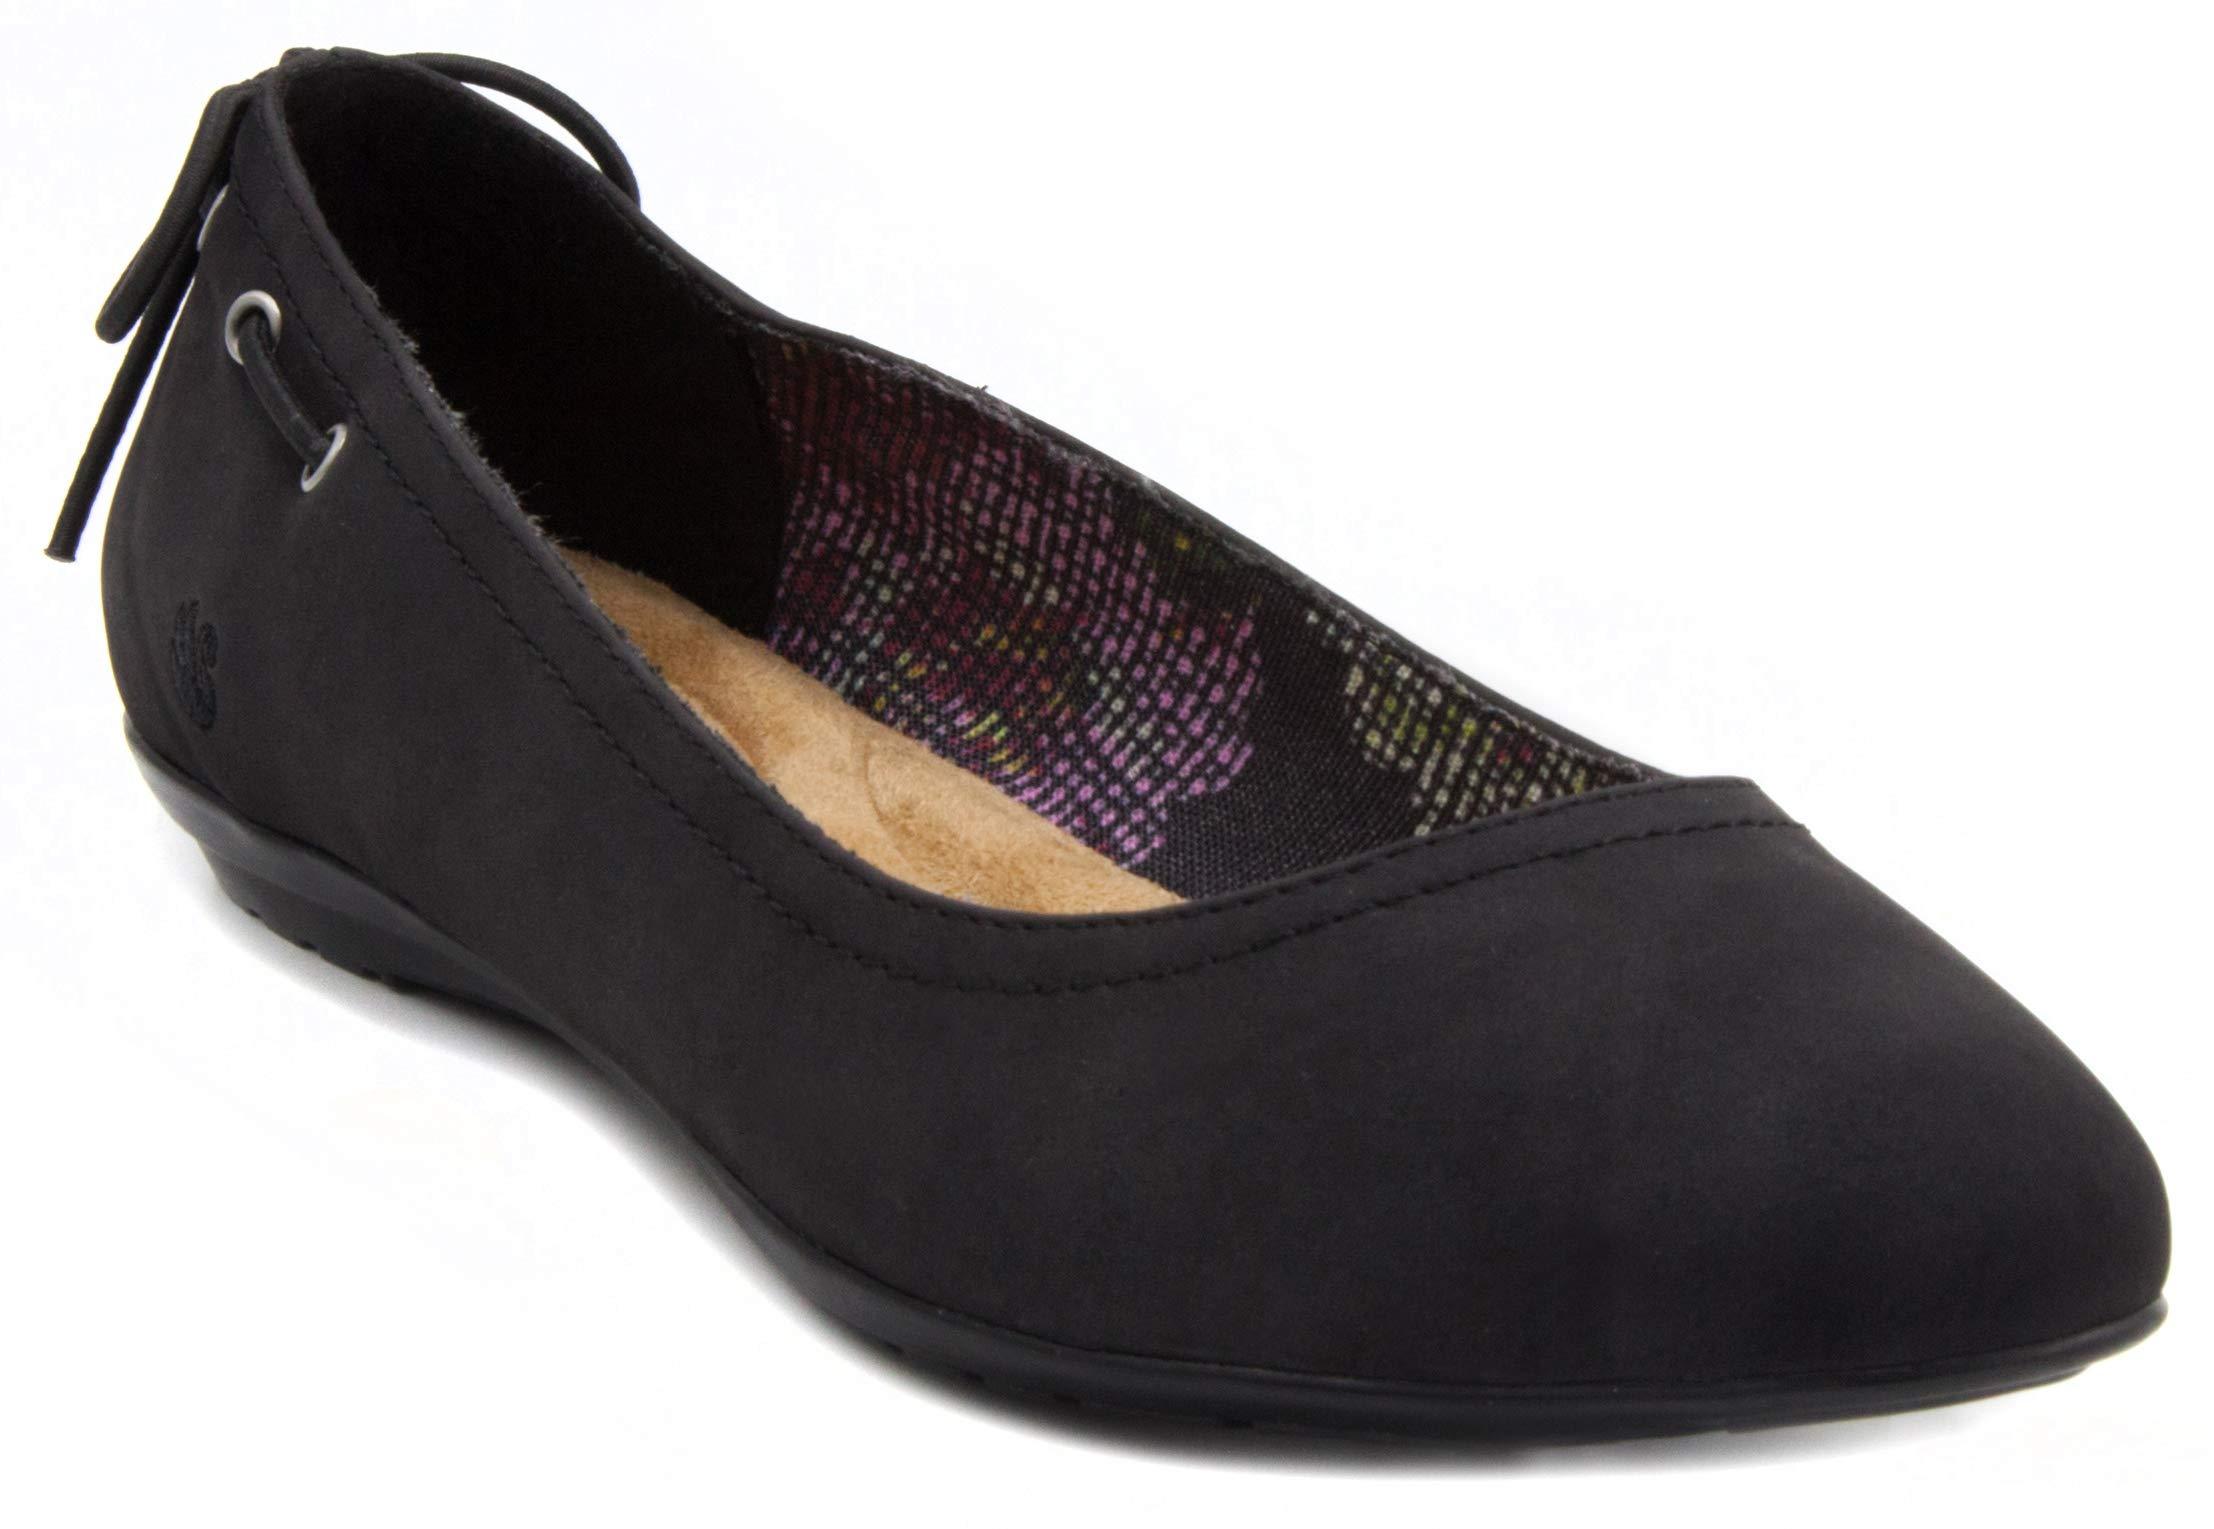 Gloria Vanderbilt Women's Nita Skimmer Flat, Slip On Pointed Toe Fashion Dress Shoe Black 9